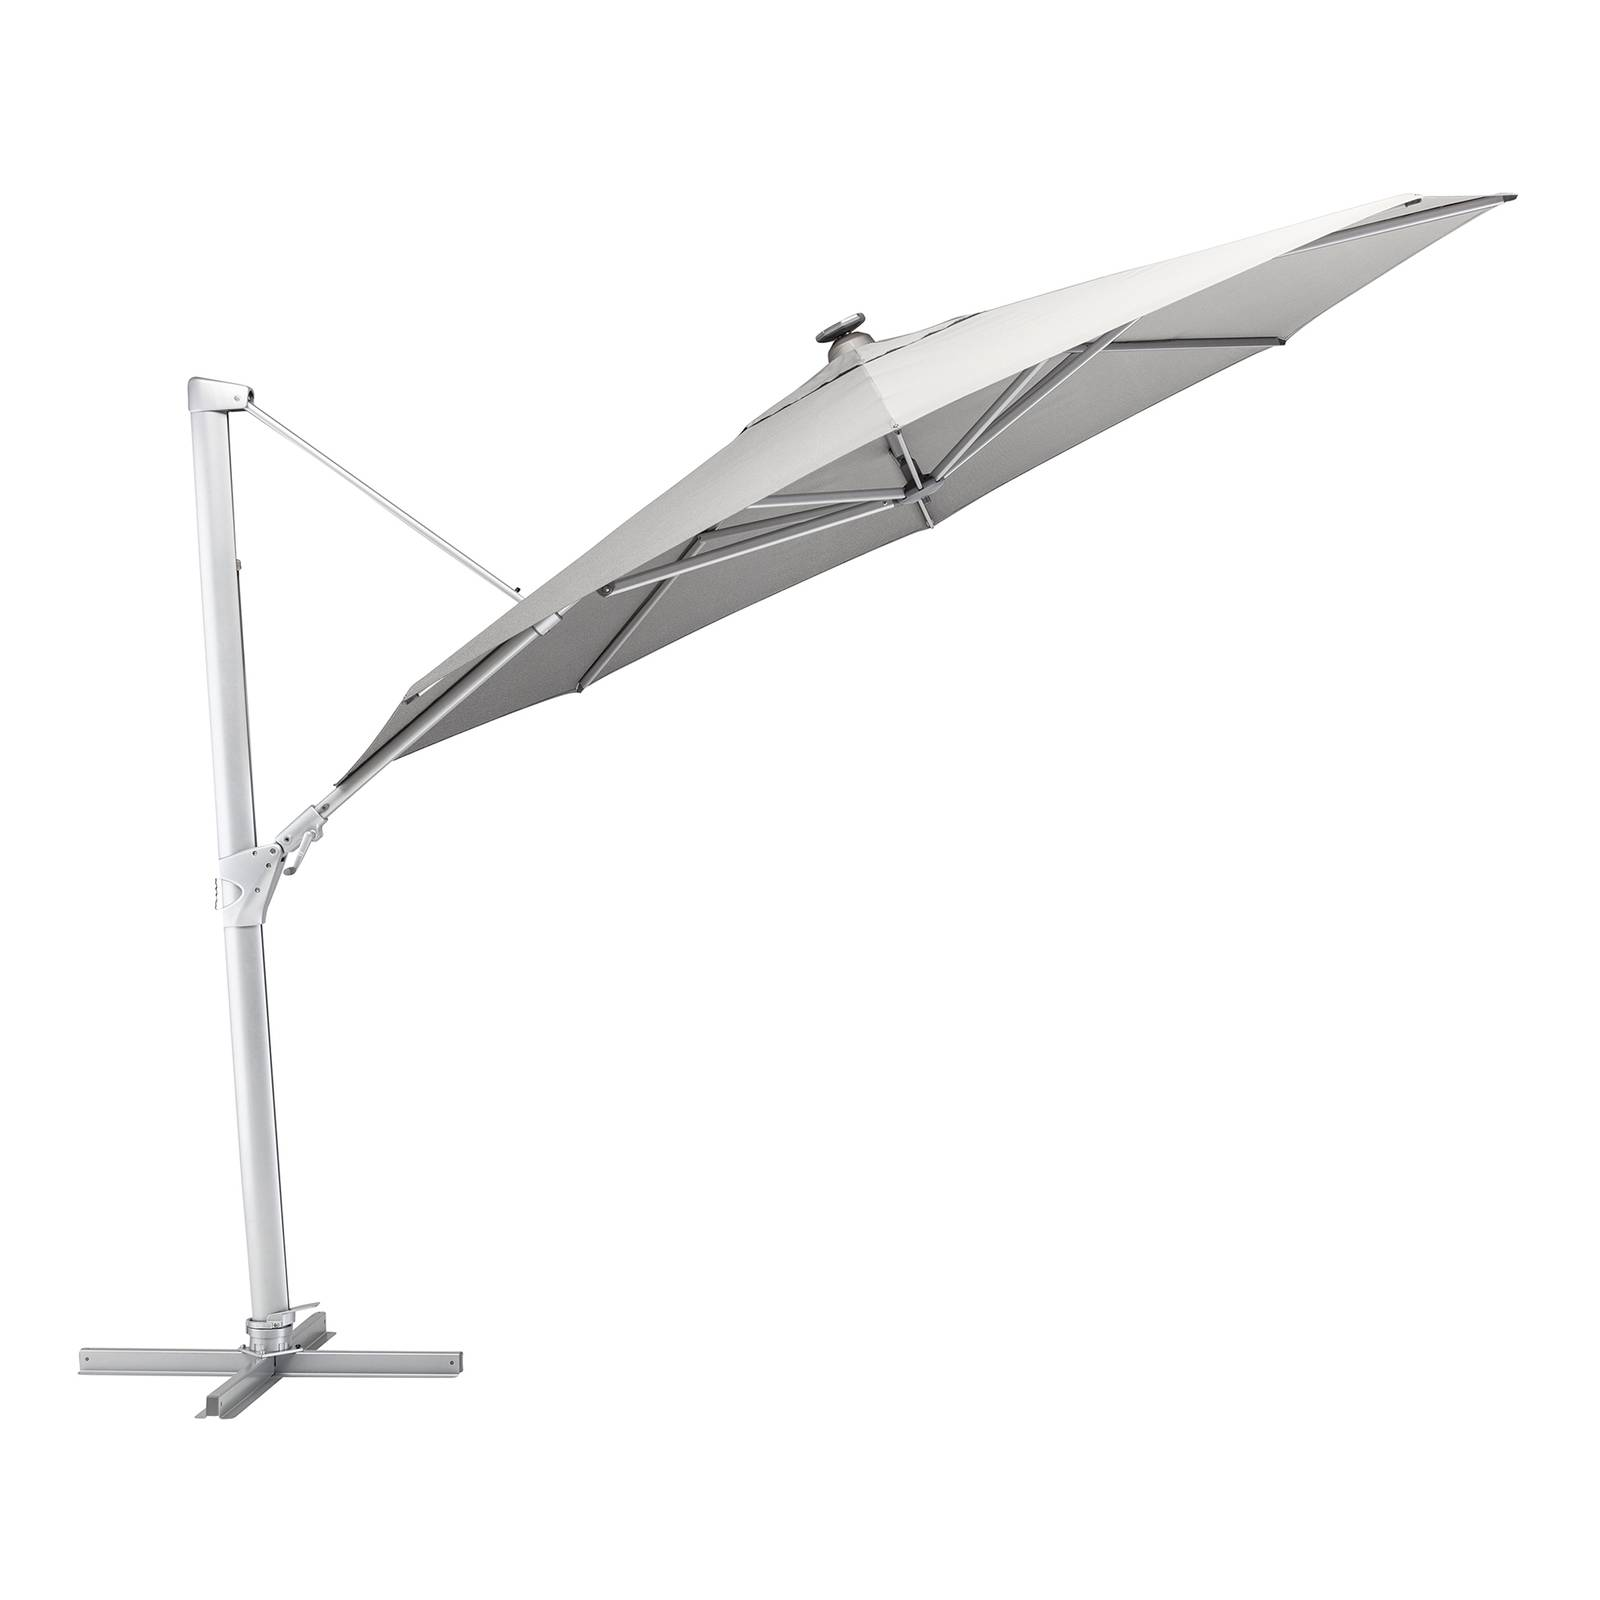 Parasol ogrodowy z oświetleneiem Easy Swing LED 3,5 m srebrny / szary KETTLER